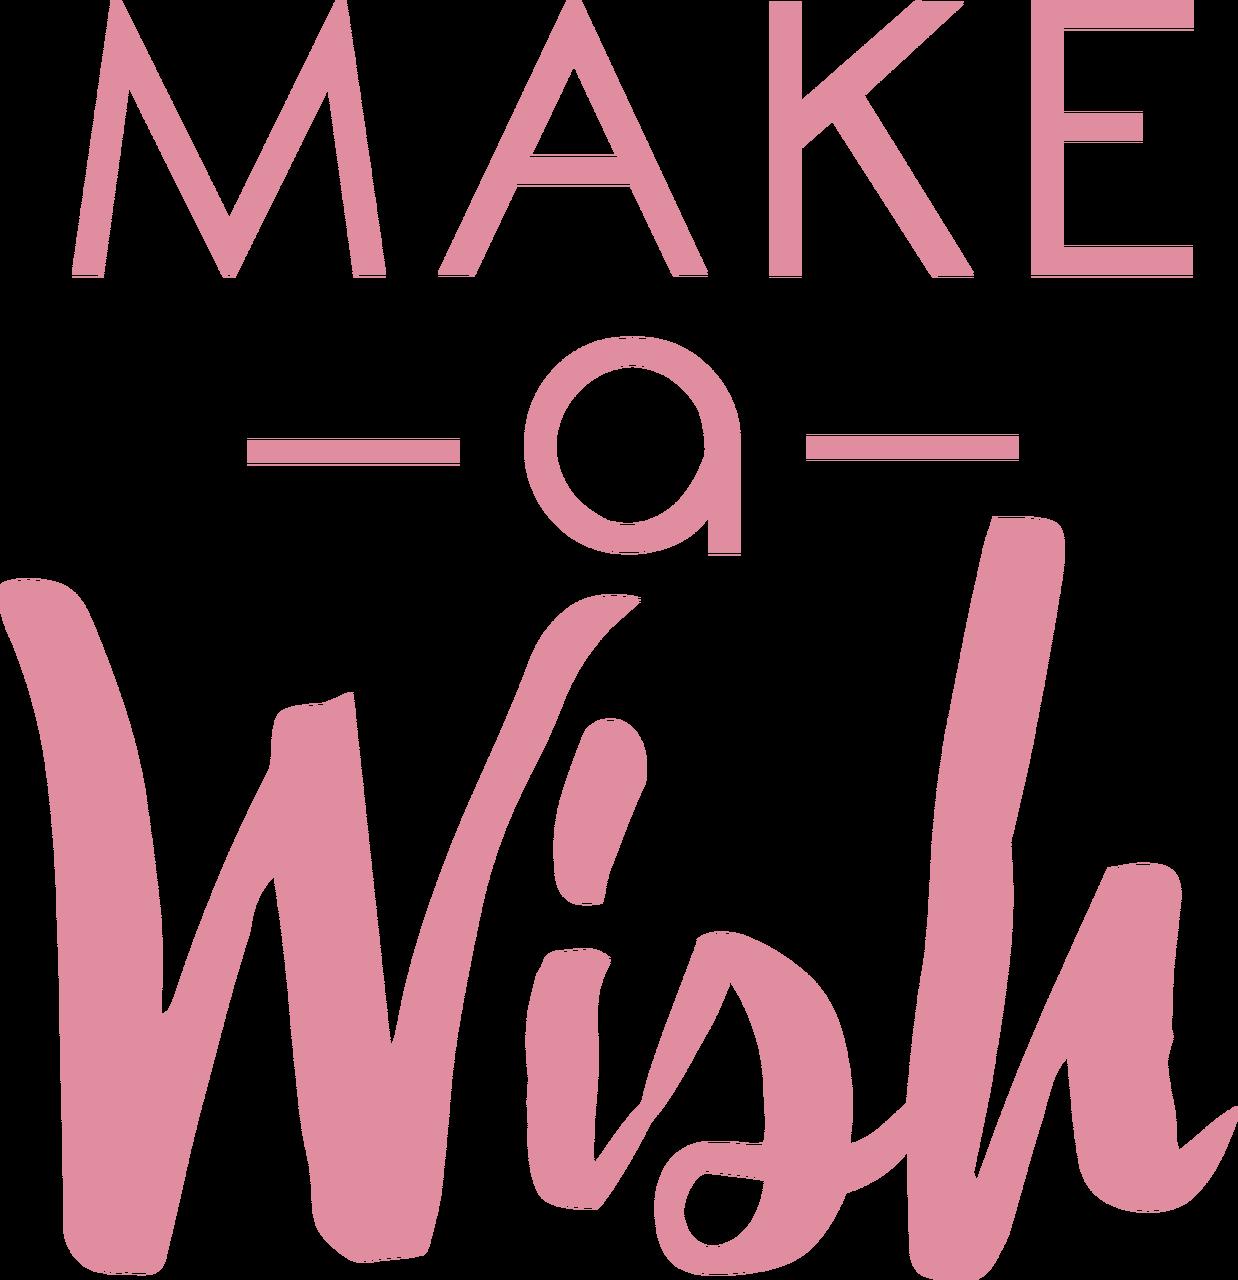 Make A Wish #2 SVG Cut File